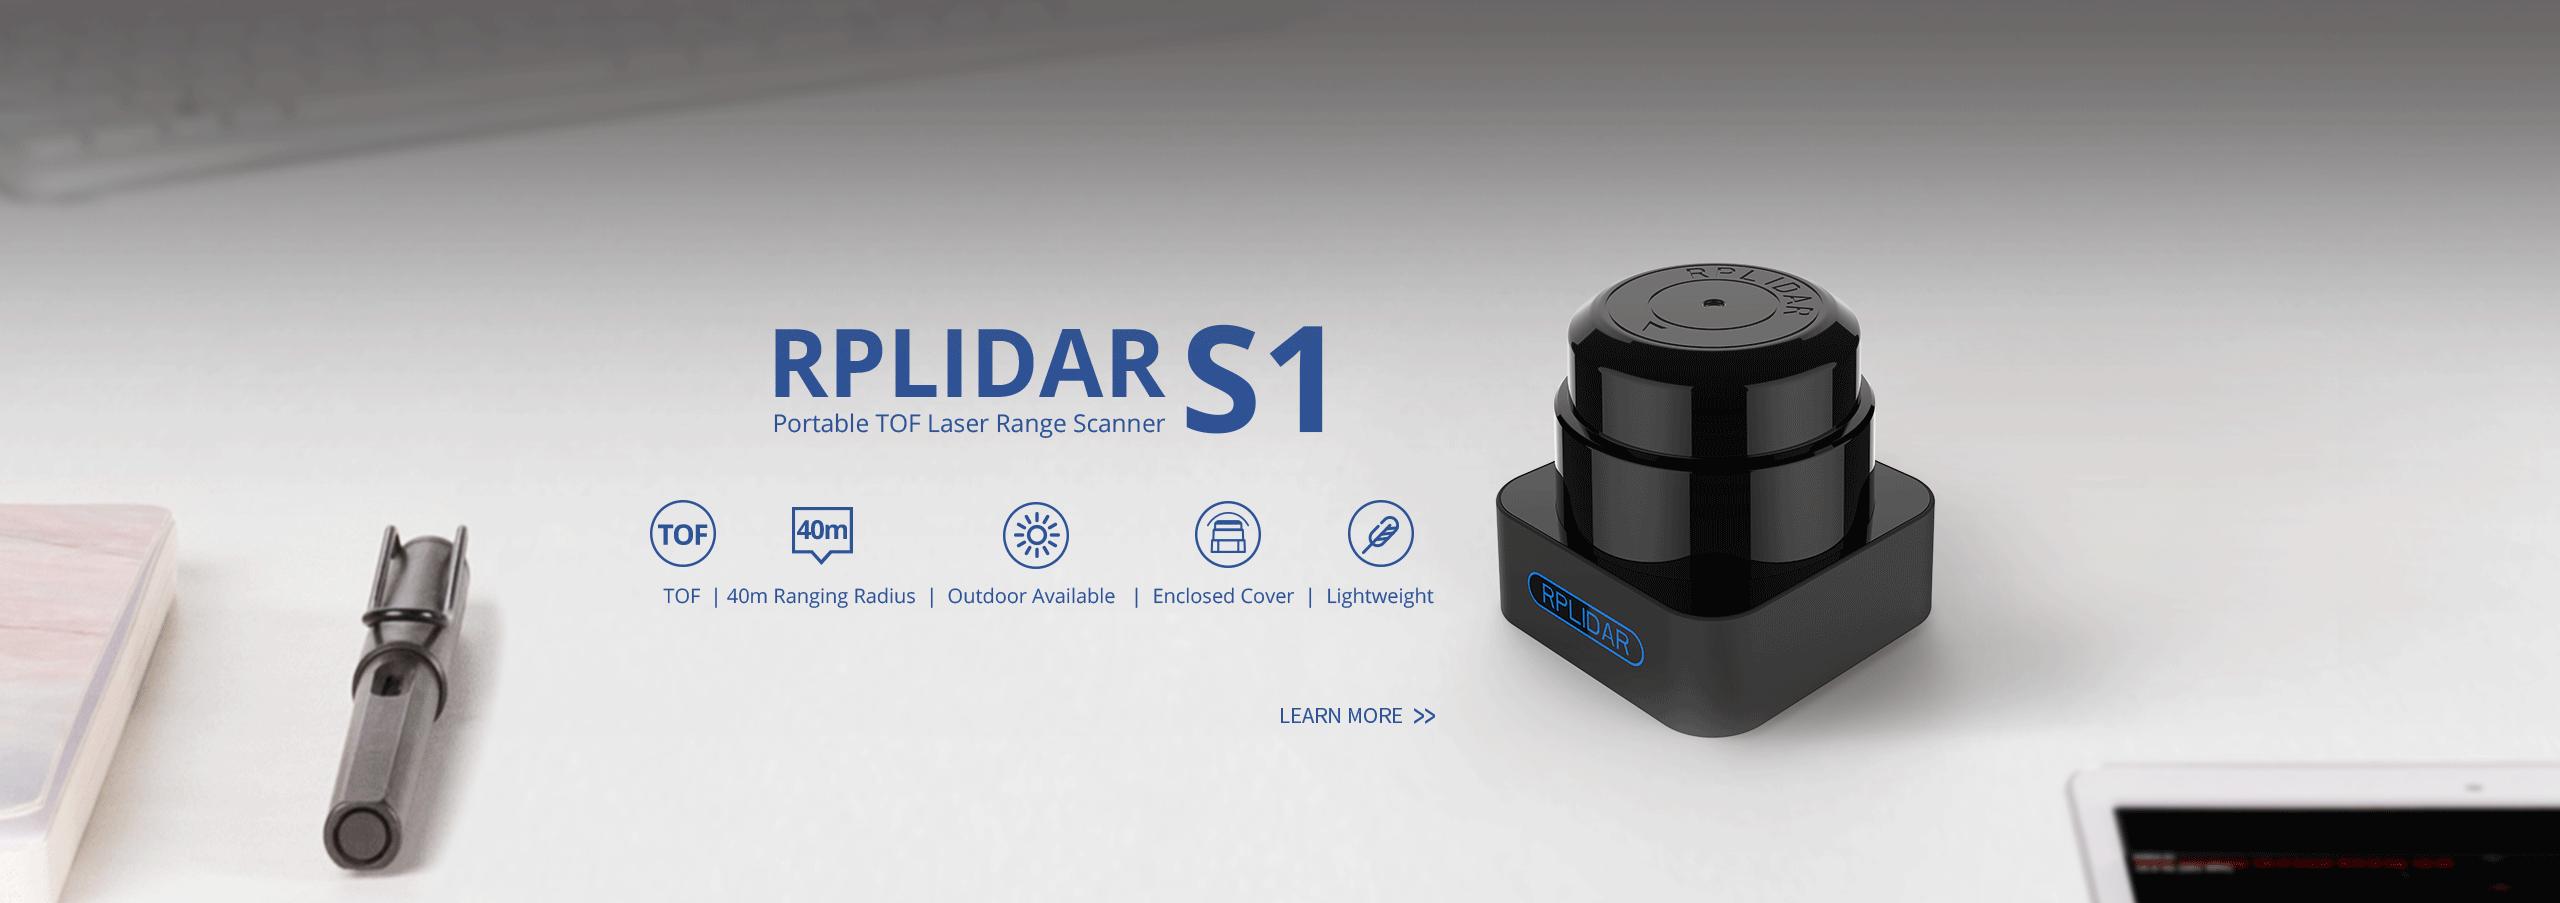 RPLIDAR S1